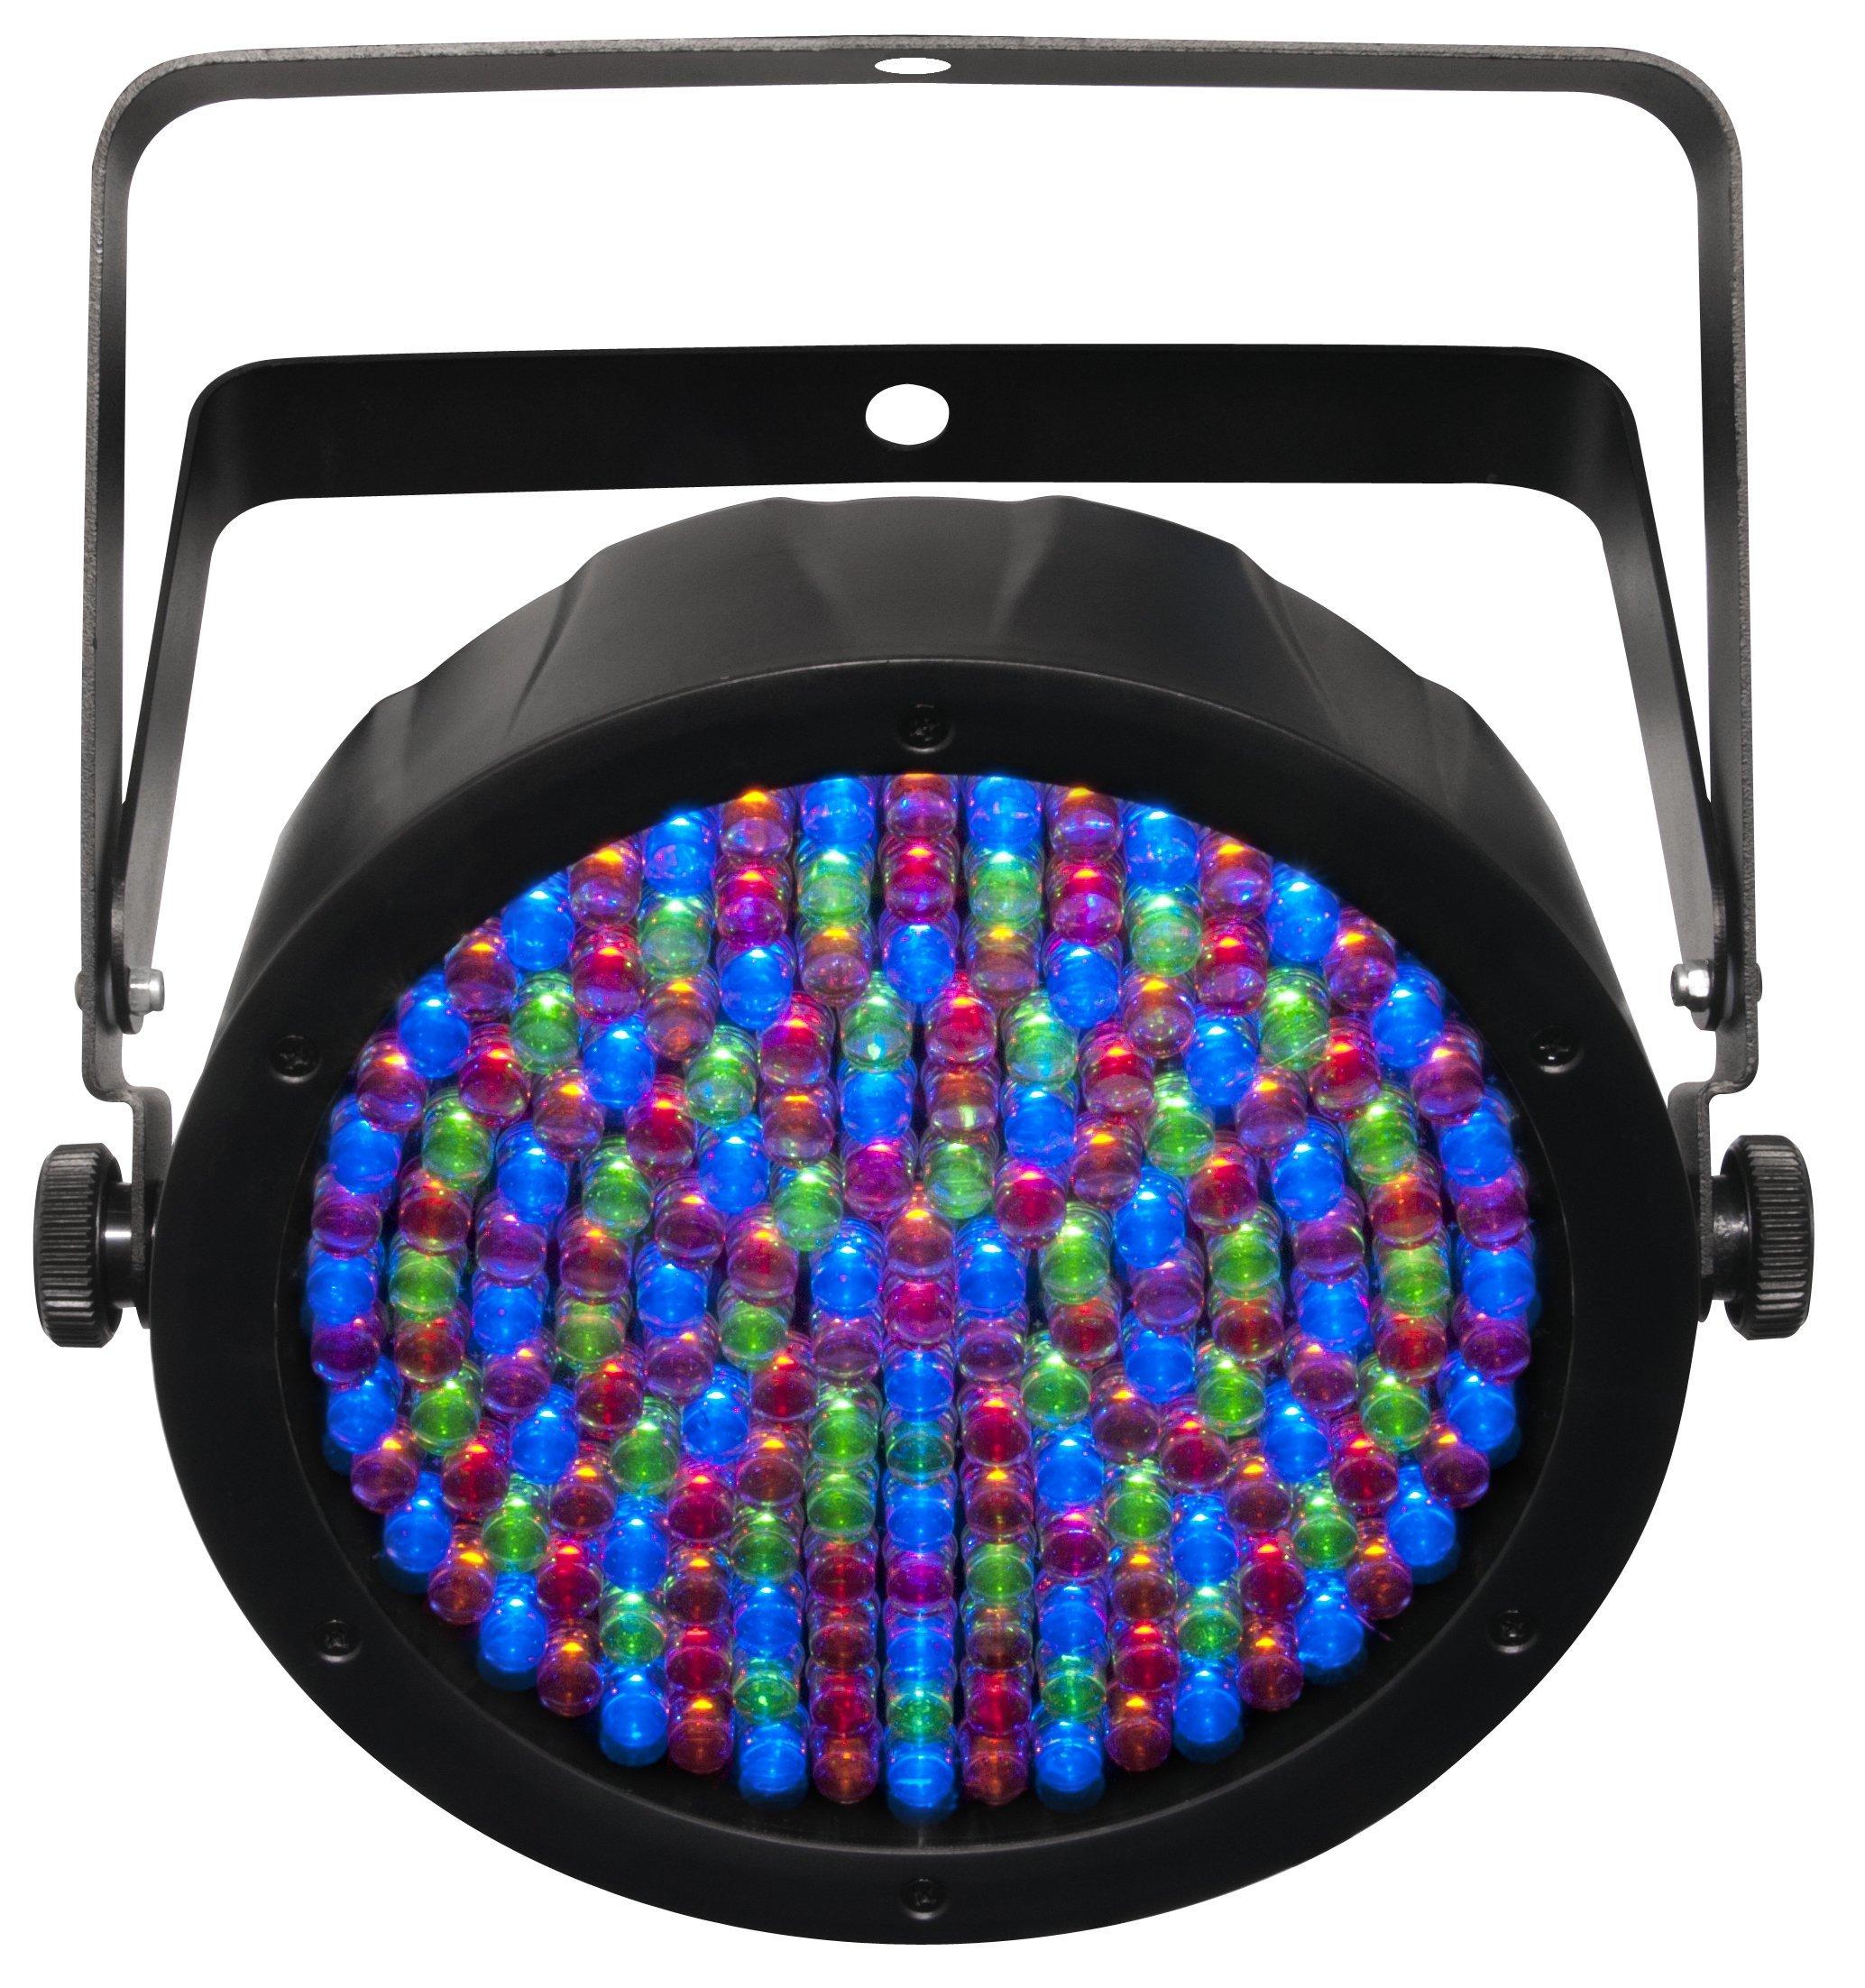 CHAUVET DJ SlimPAR 64 RGBA LED Par Can Wash Light   LED Lighting